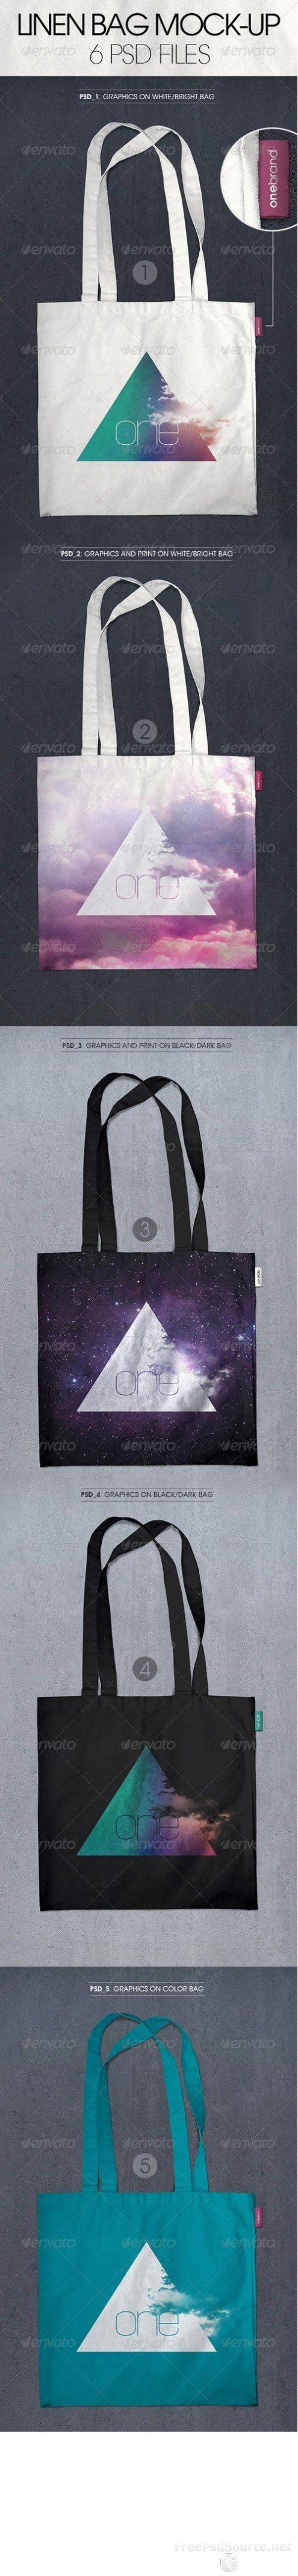 Linen Bag Mock-up 5837206 » Graphicriver free . Free Download Psd Source , Tutorials , Vectors , Stock